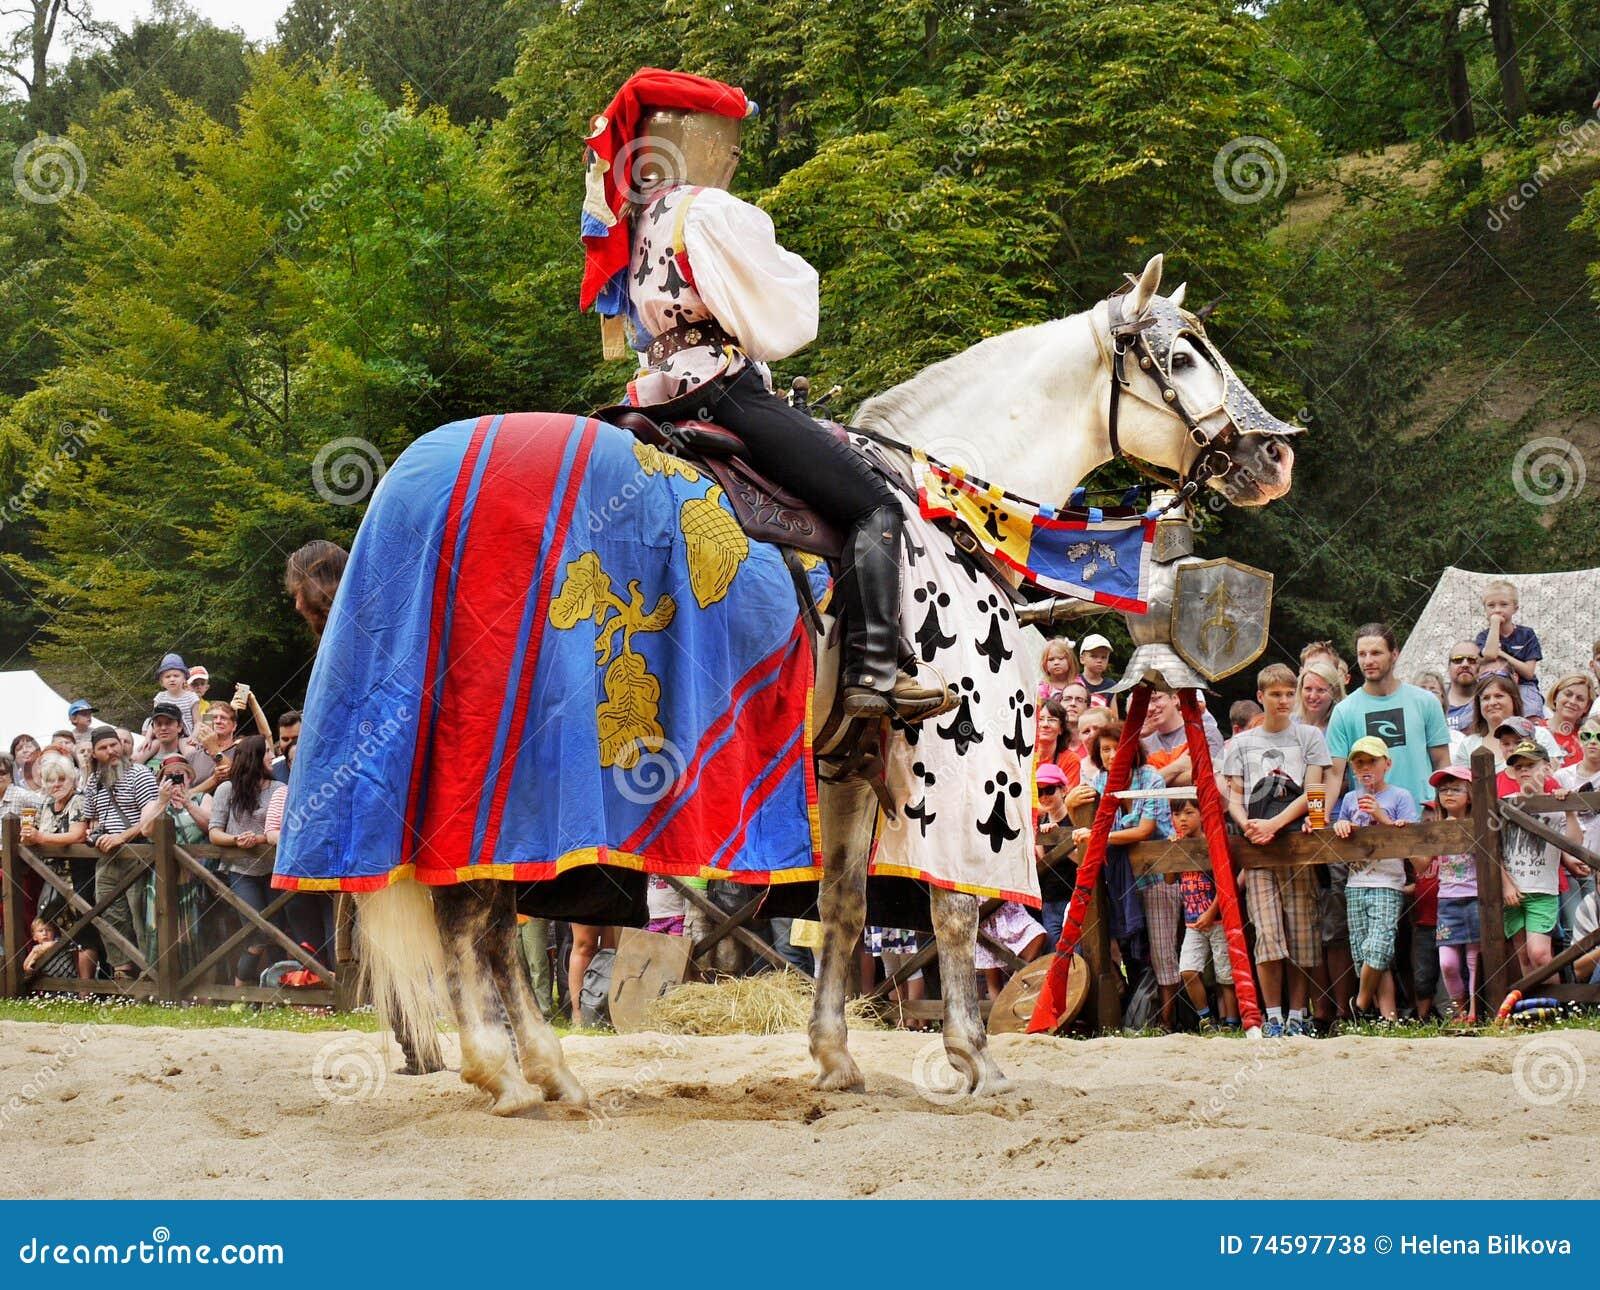 Princesse cheval festival m di val de chevaliers photo stock ditorial image 74597738 - Princesse cheval ...